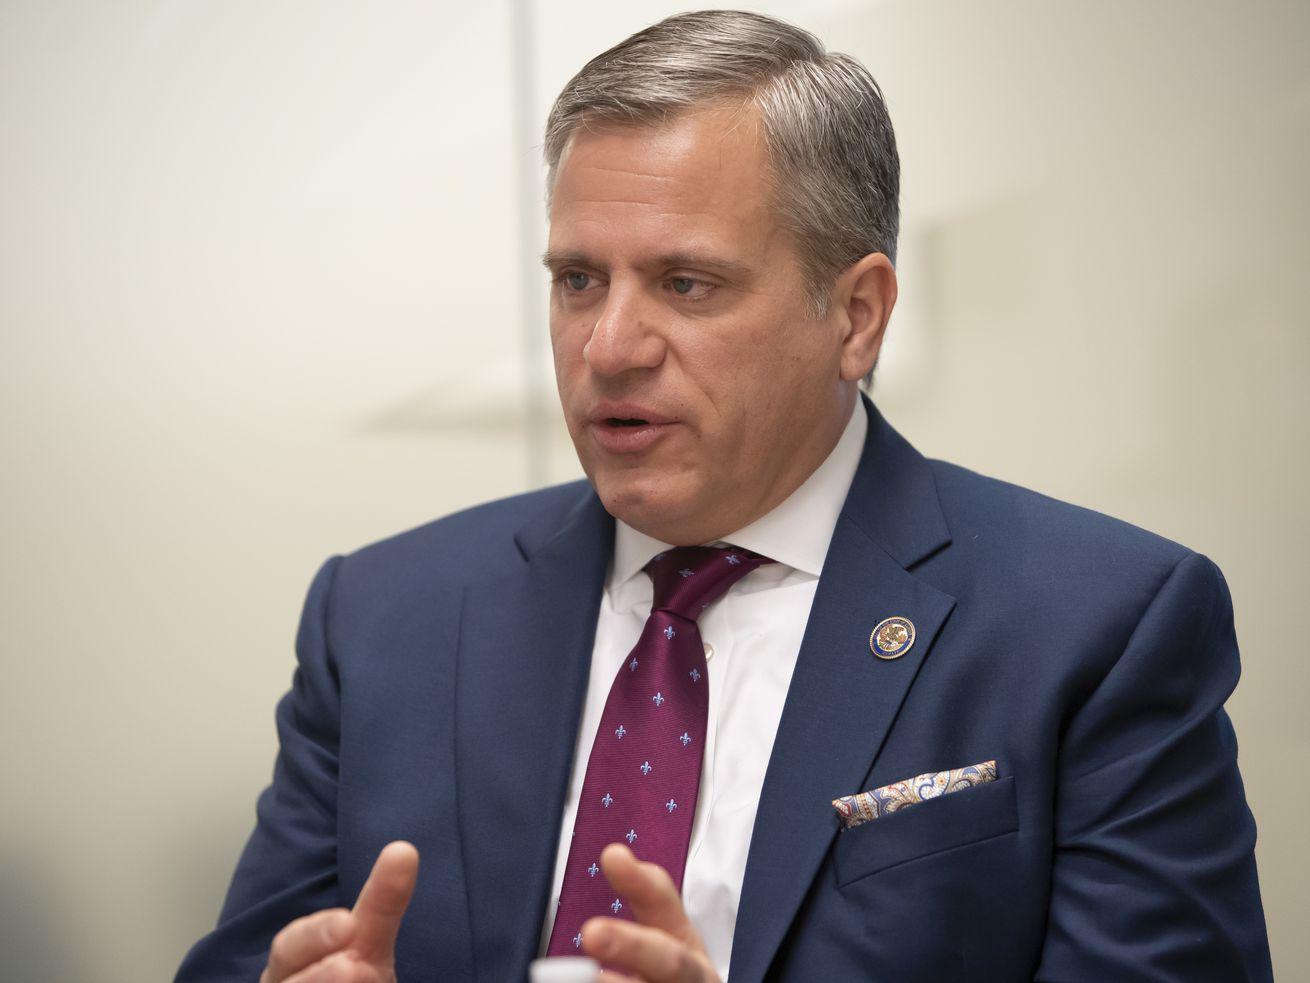 Robert F. Martwick, Illinois Senate 10th District Democratic nominee and incumbent, 2020 election, endorsement